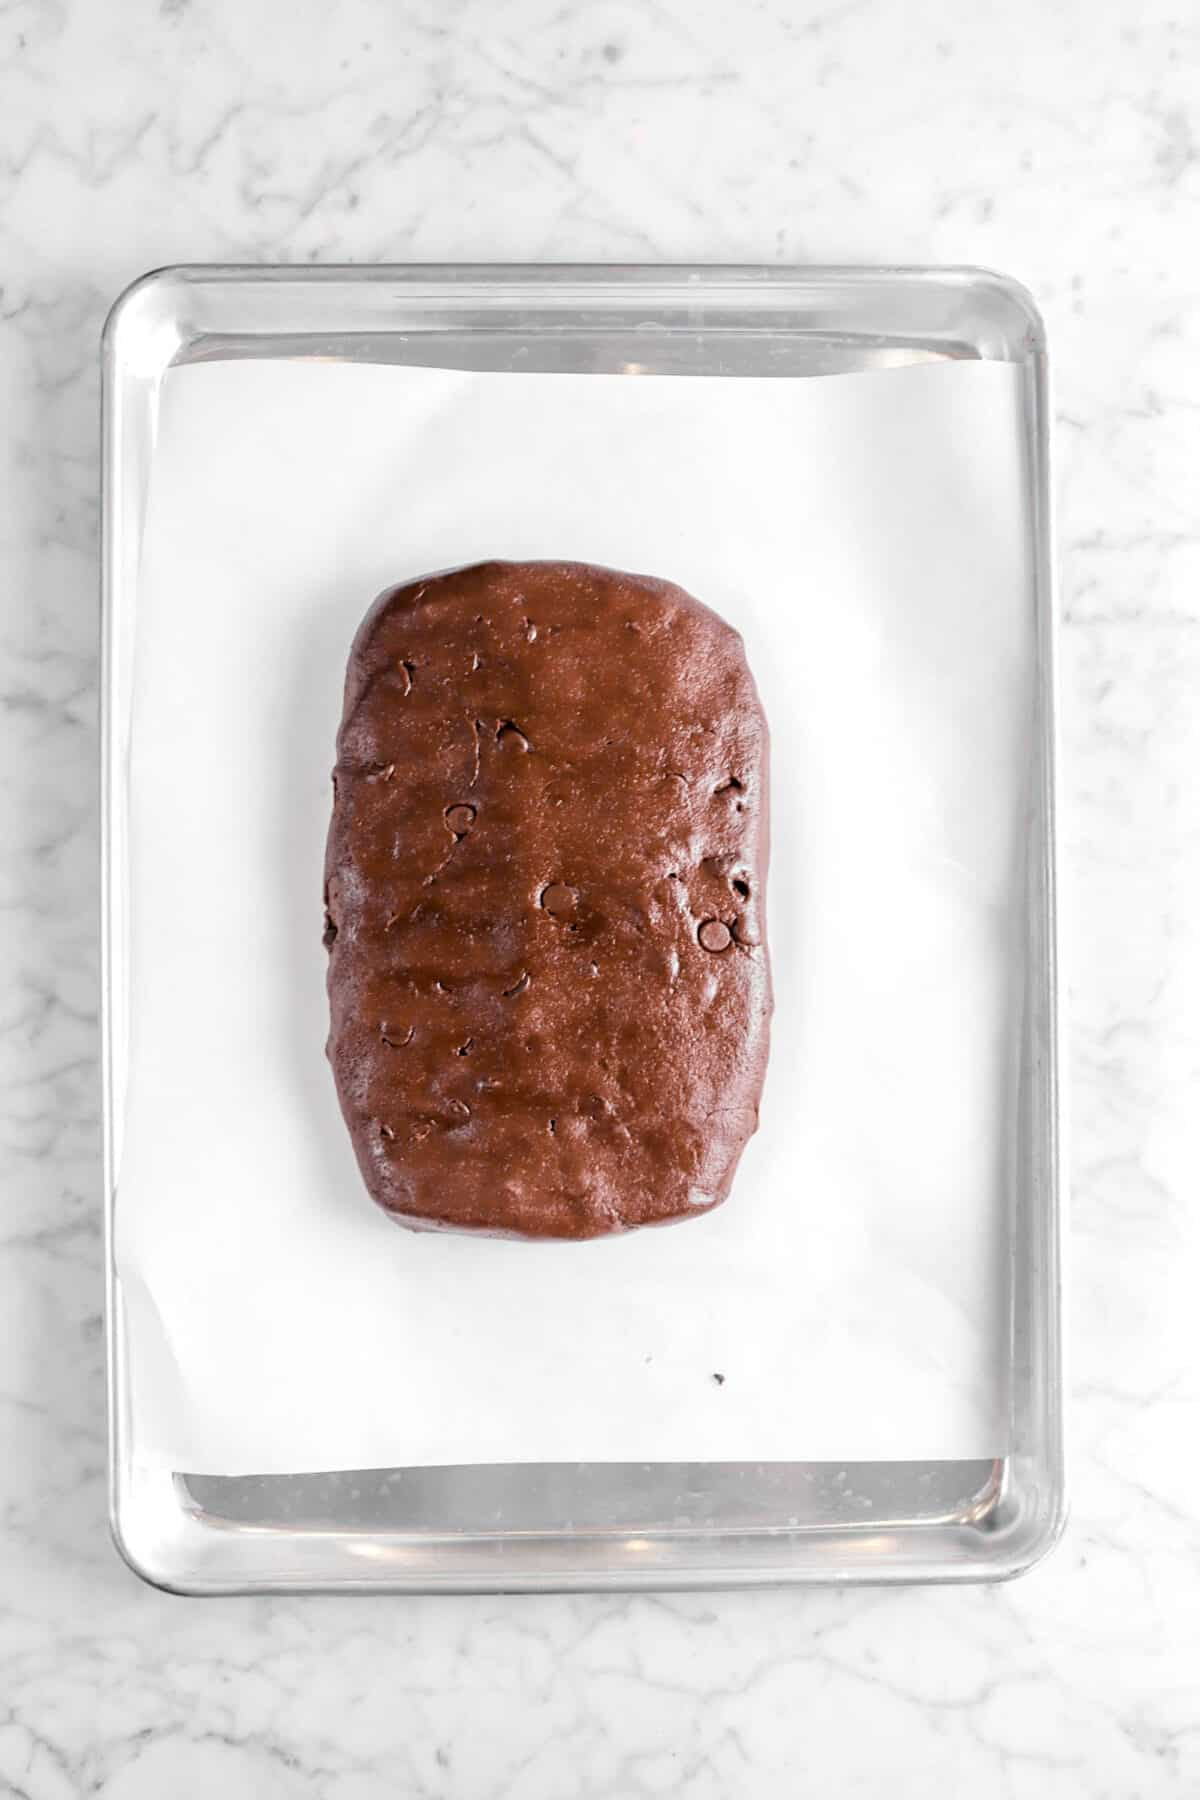 chocolate biscotti dough on lined baking sheet